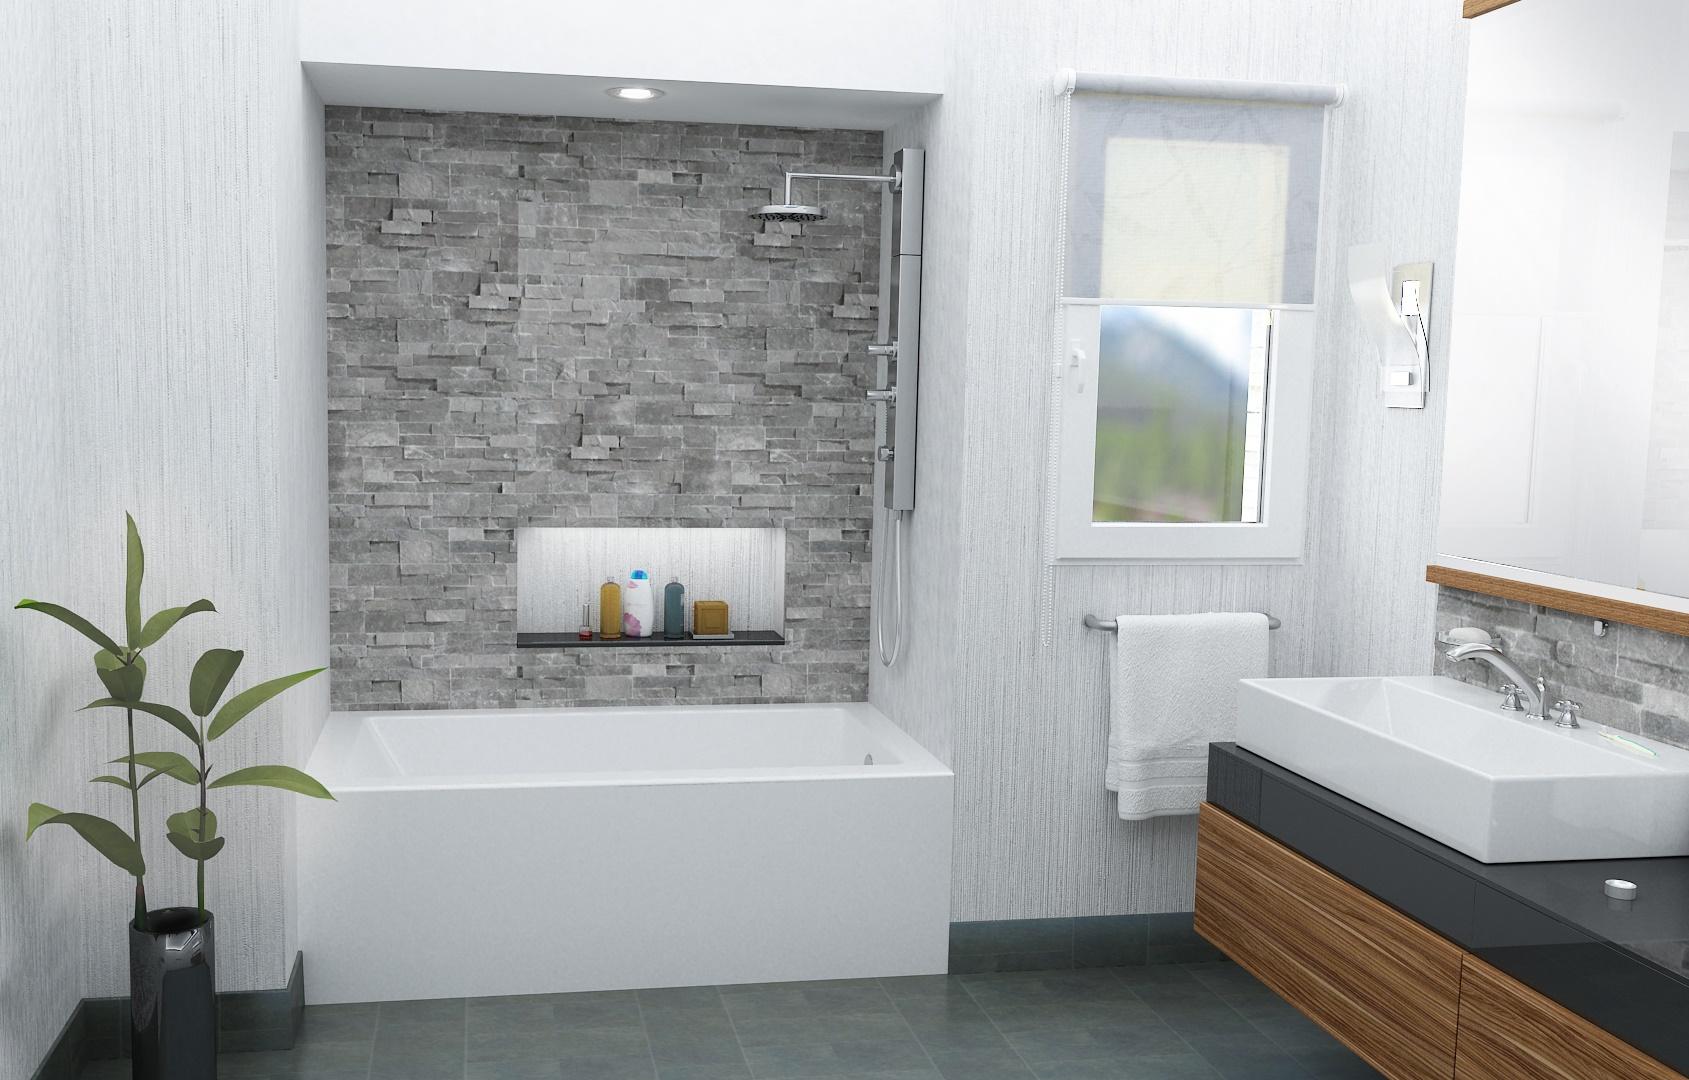 Bath tub bedding: mortar or foam or...? (after tub in place/installed)-adora-scene_new.jpg